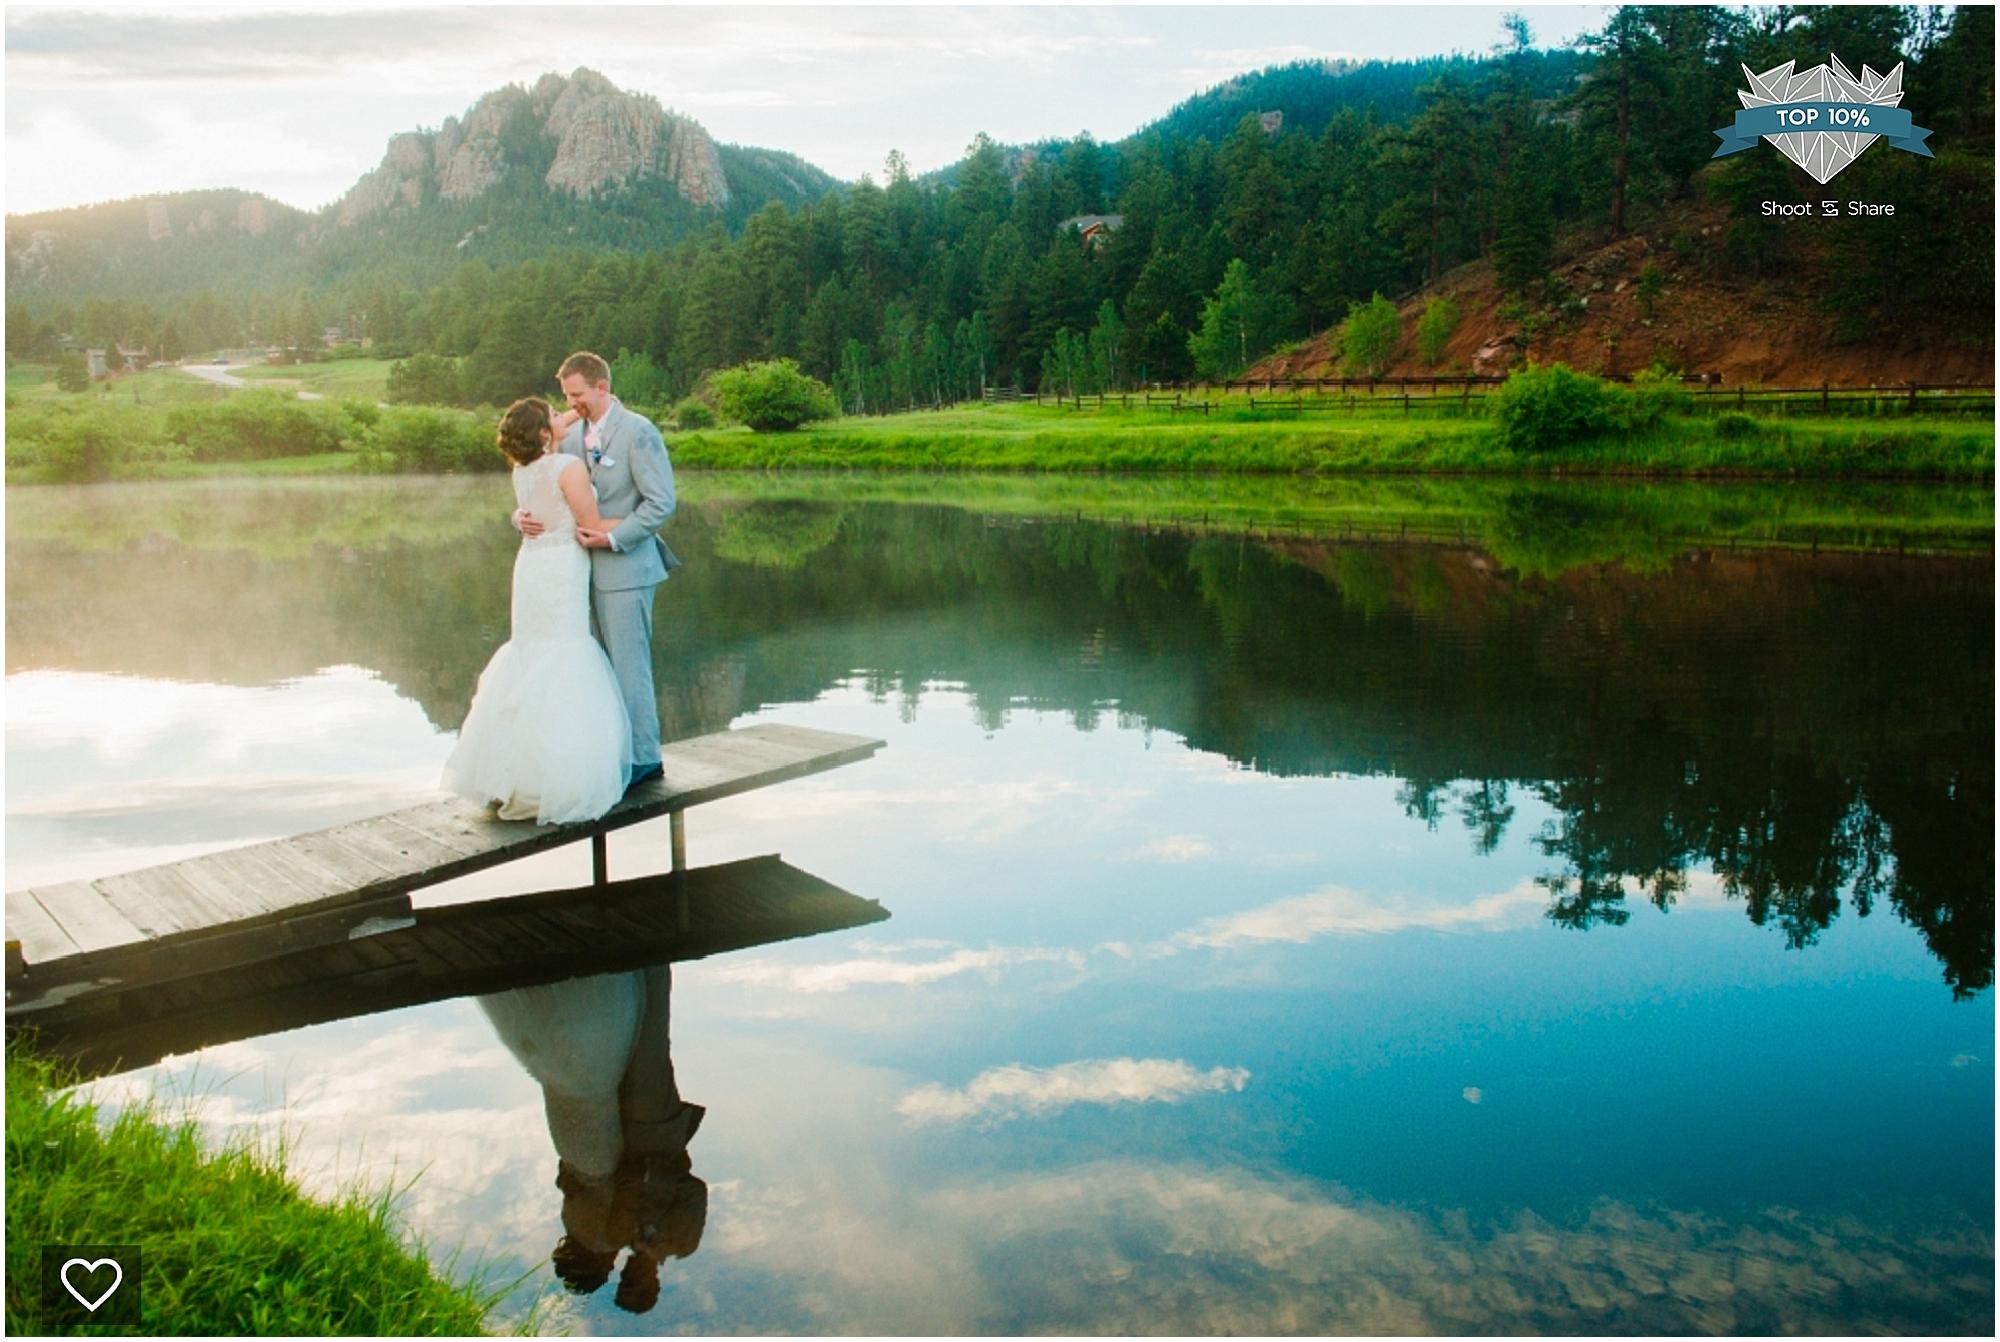 shoot and share, colorado wedding pictures, denver wedding pictures, colorado wedding photographer, colorado lake, couple near lake